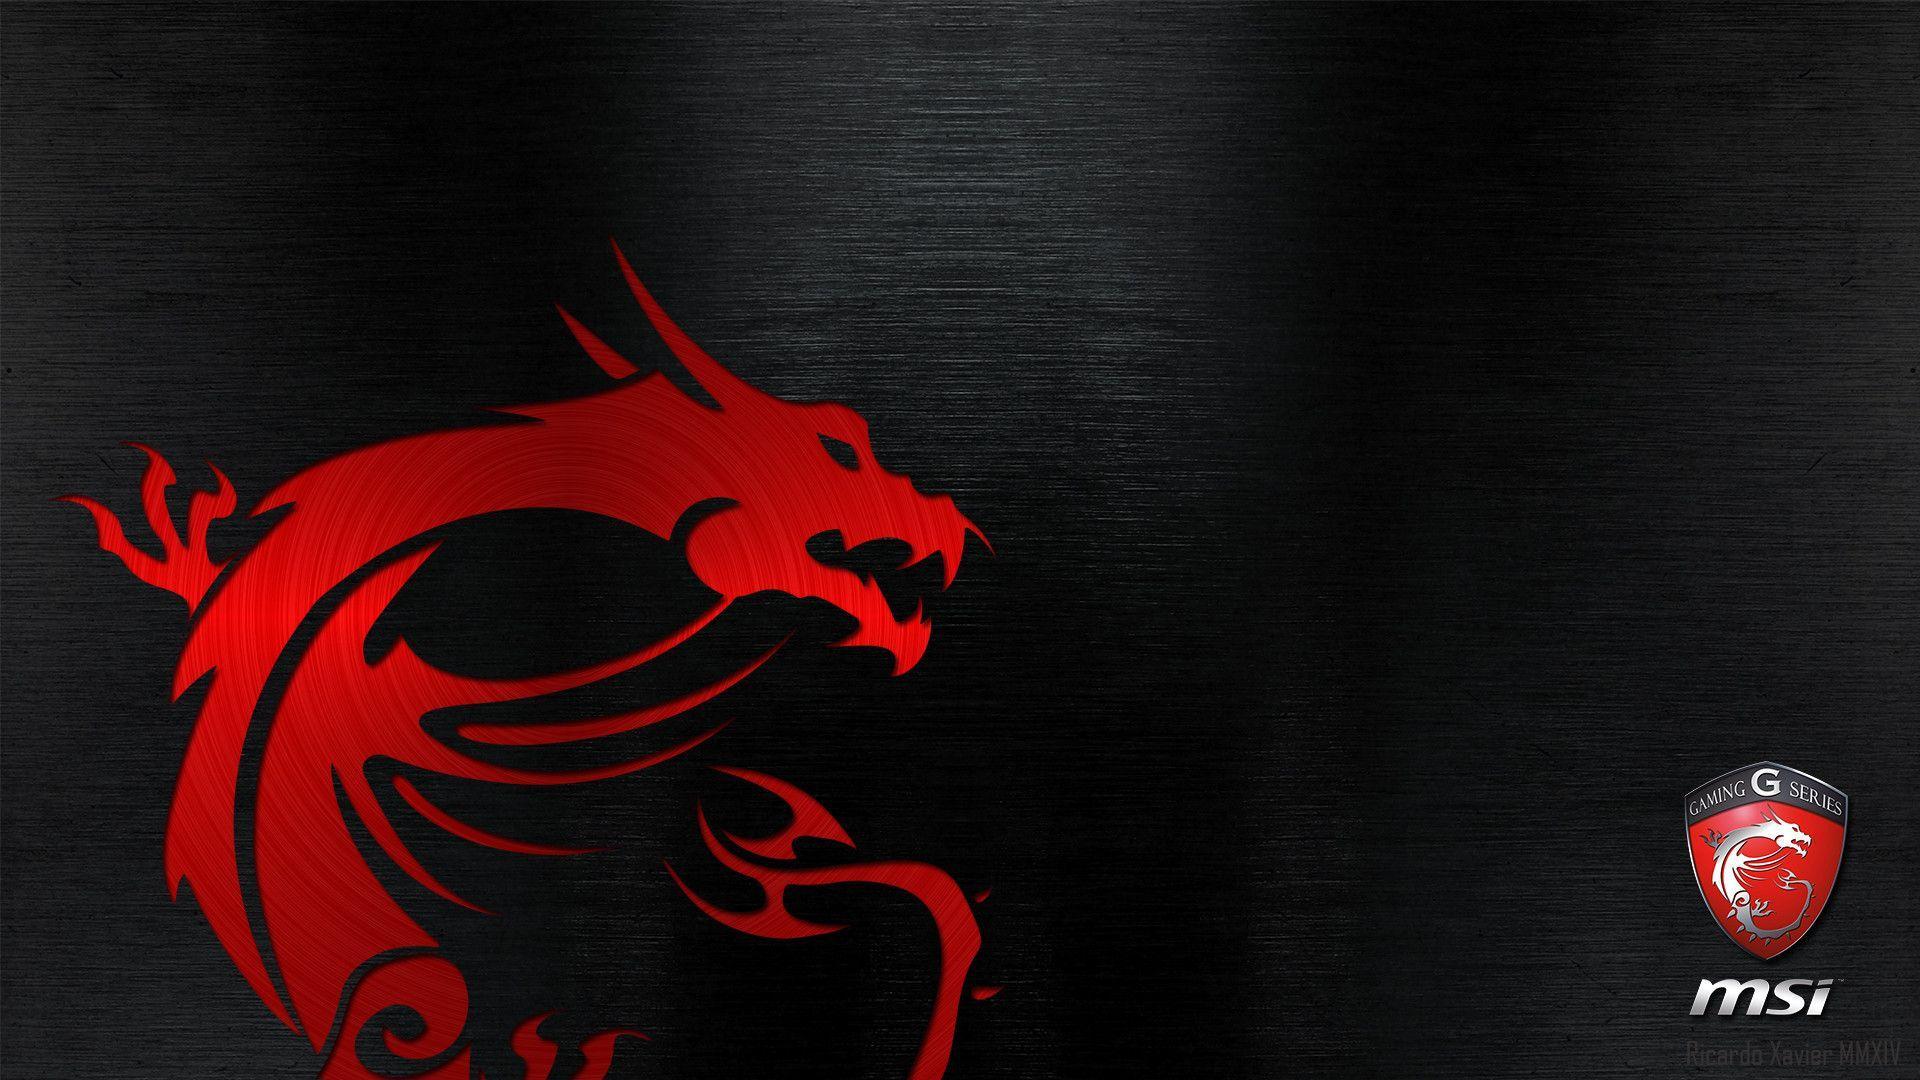 MSI Gaming Wallpapers - Top Free MSI Gaming Backgrounds